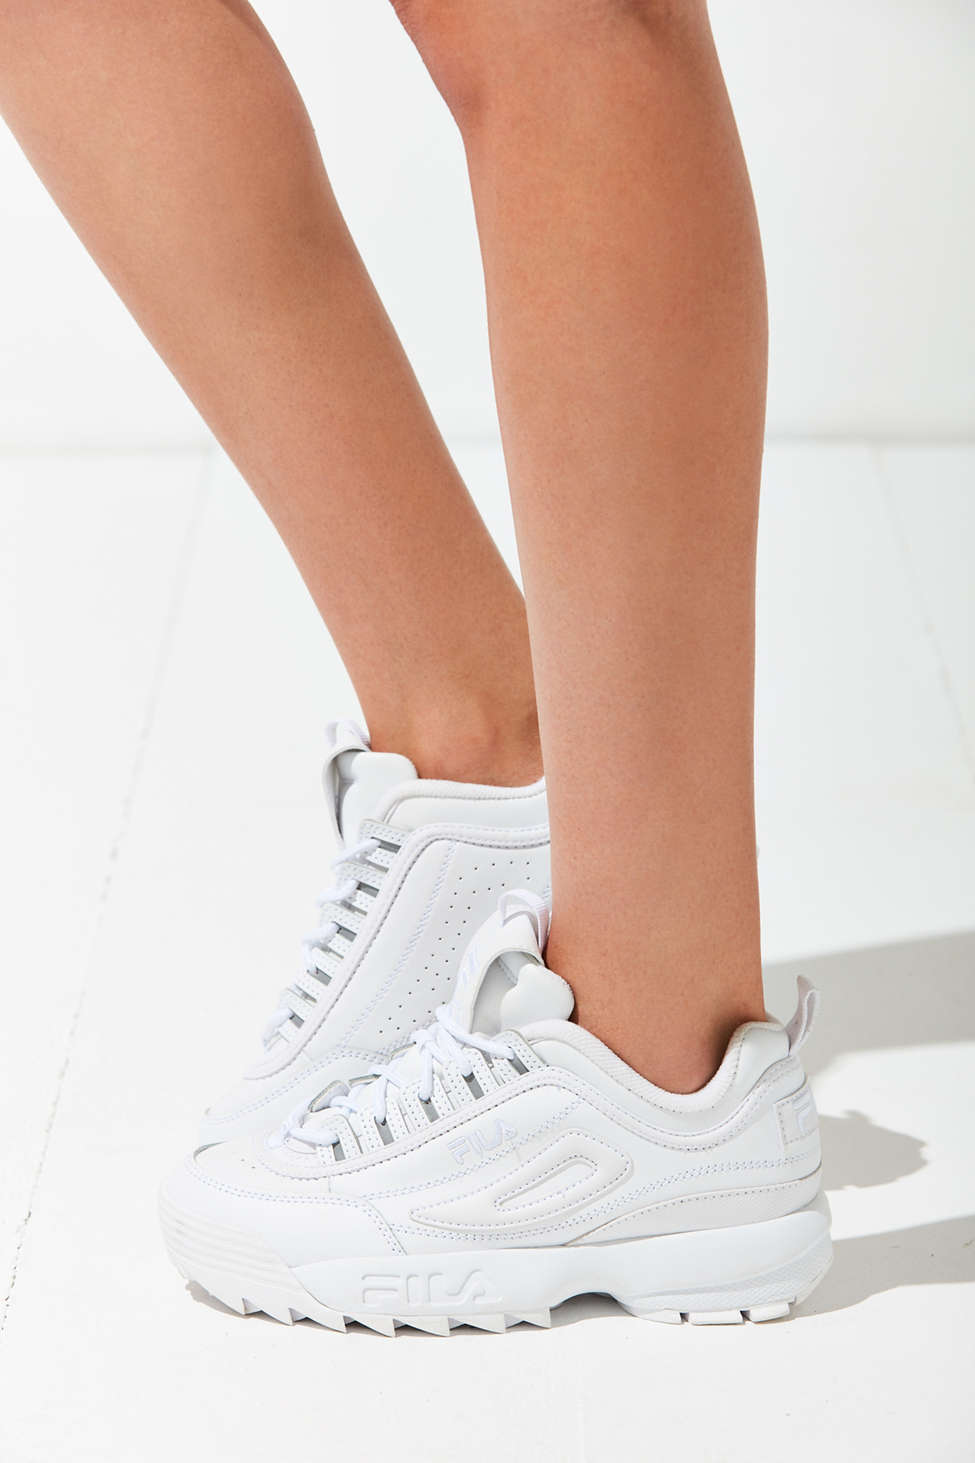 Fila Disruptor 2 Premium Mono Sneaker Urban Outfitters